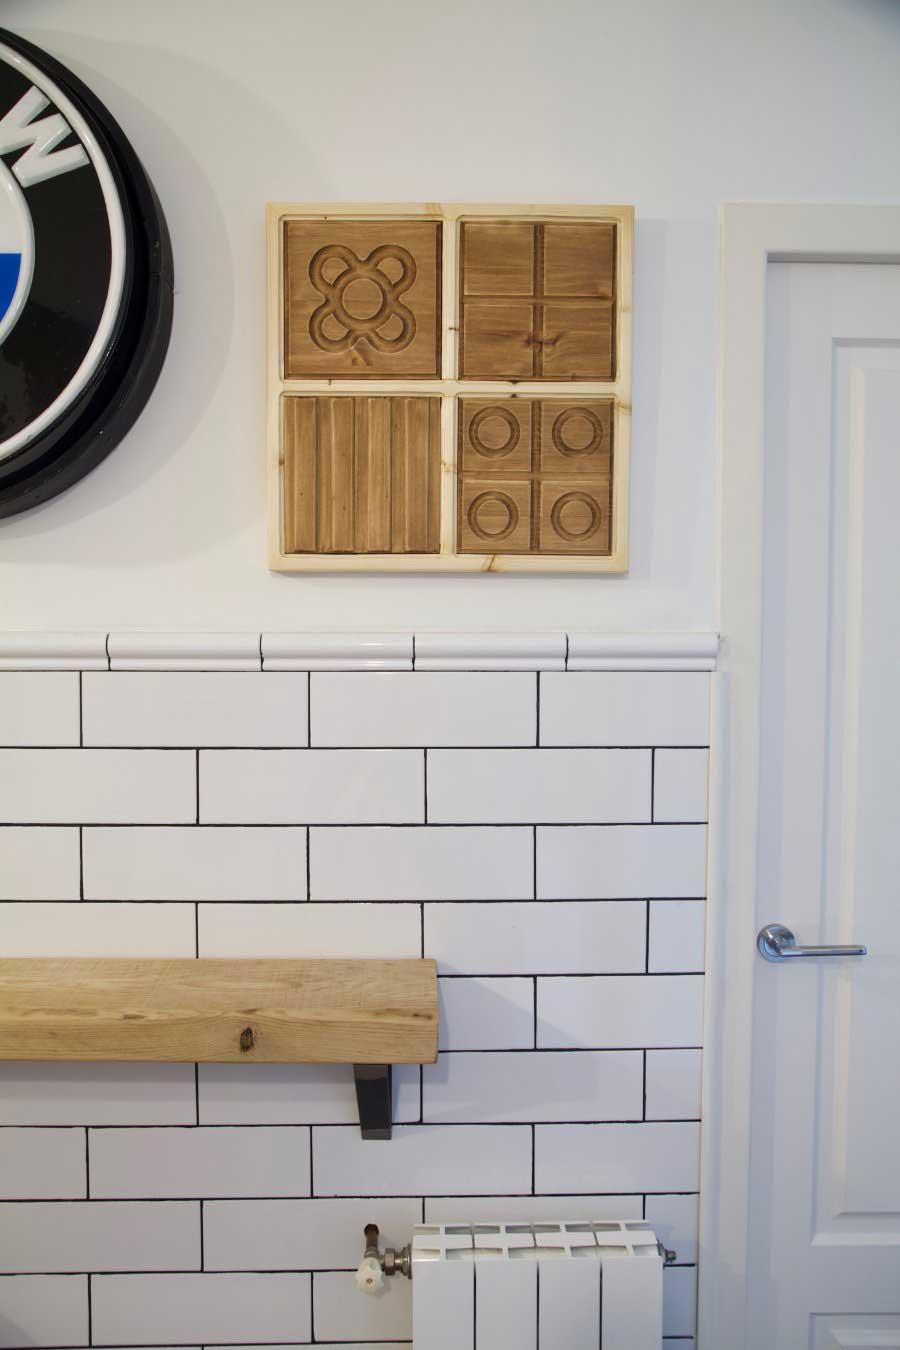 Cuadro con panots de Barcelona en pared de cocina